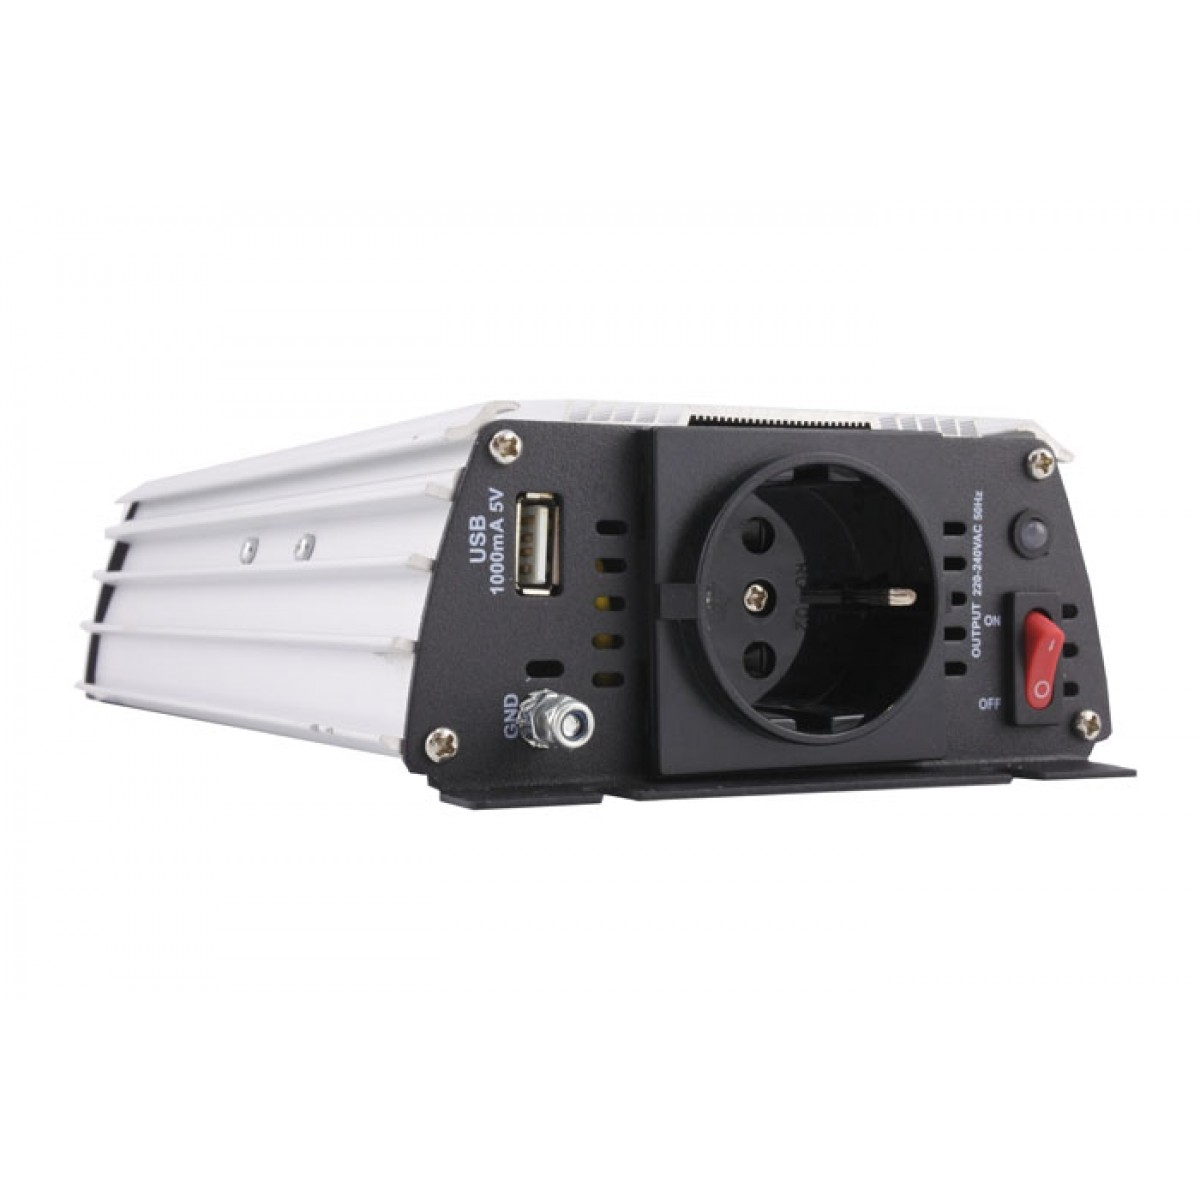 Inverter μετατροπέας 500W BORMANN BMI1200